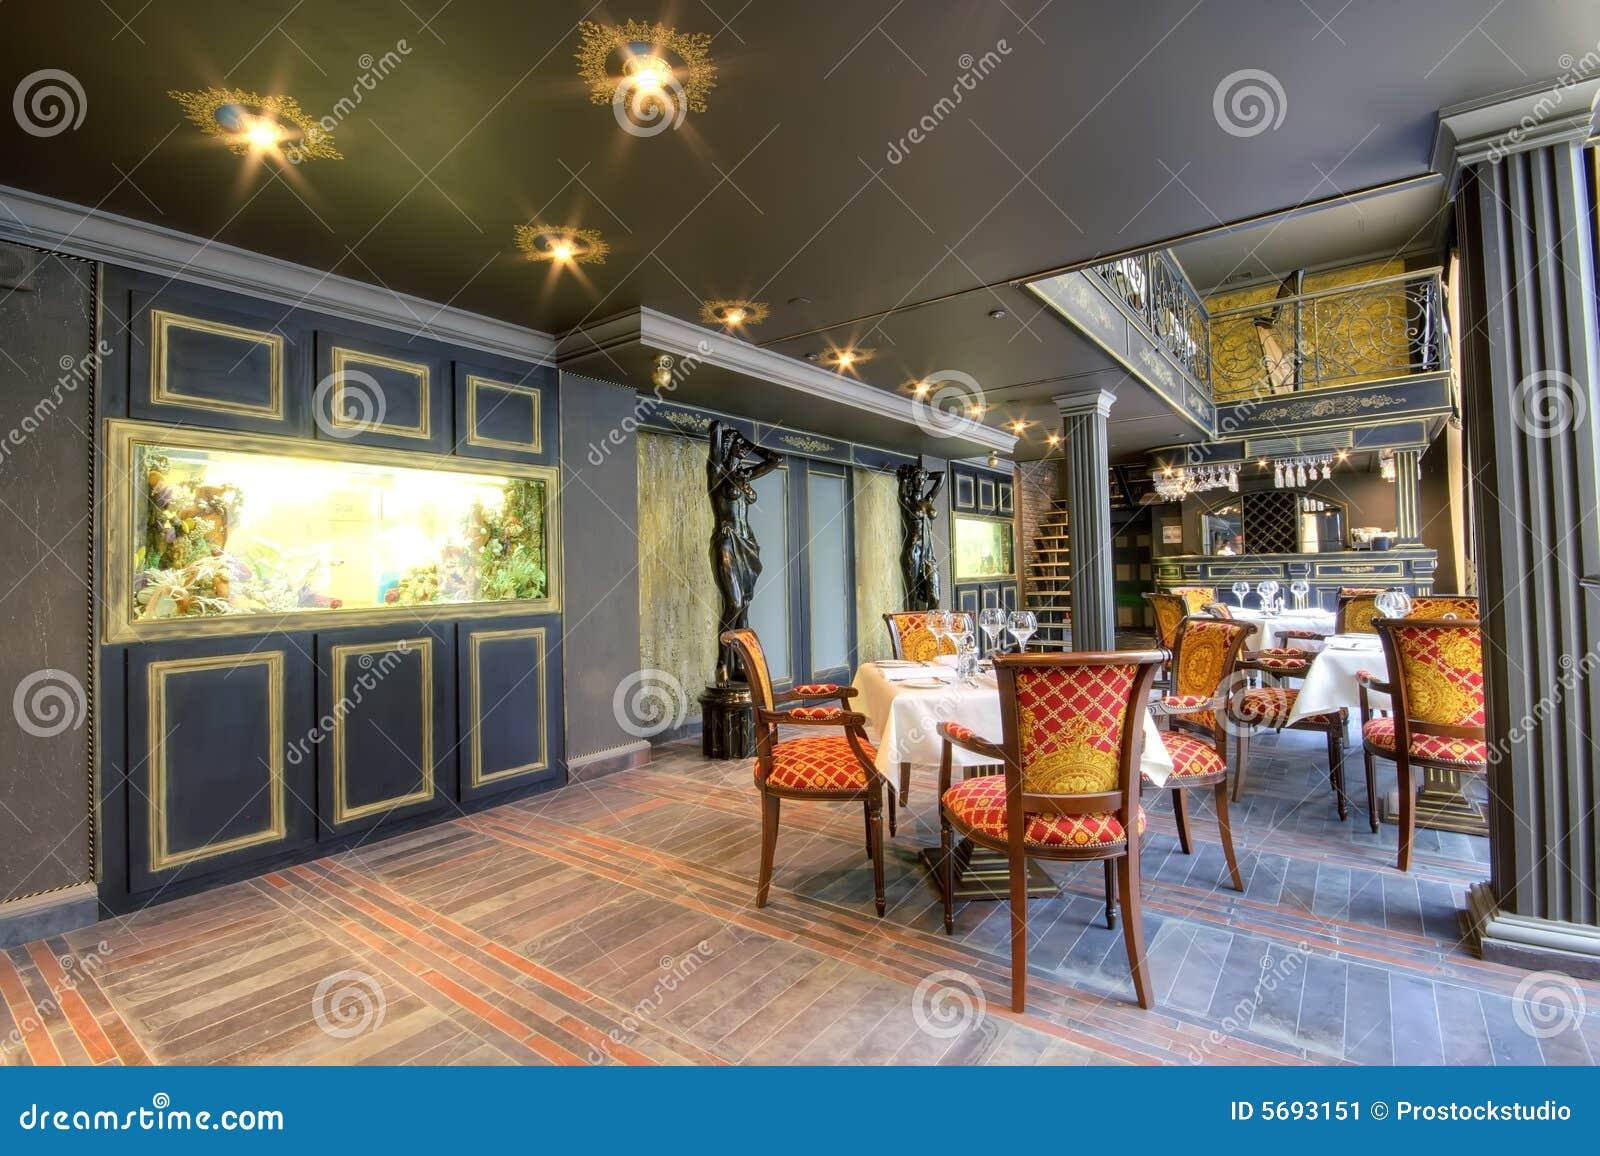 Restaurant Interior Supplies : Luxurious restaurant interior stock image